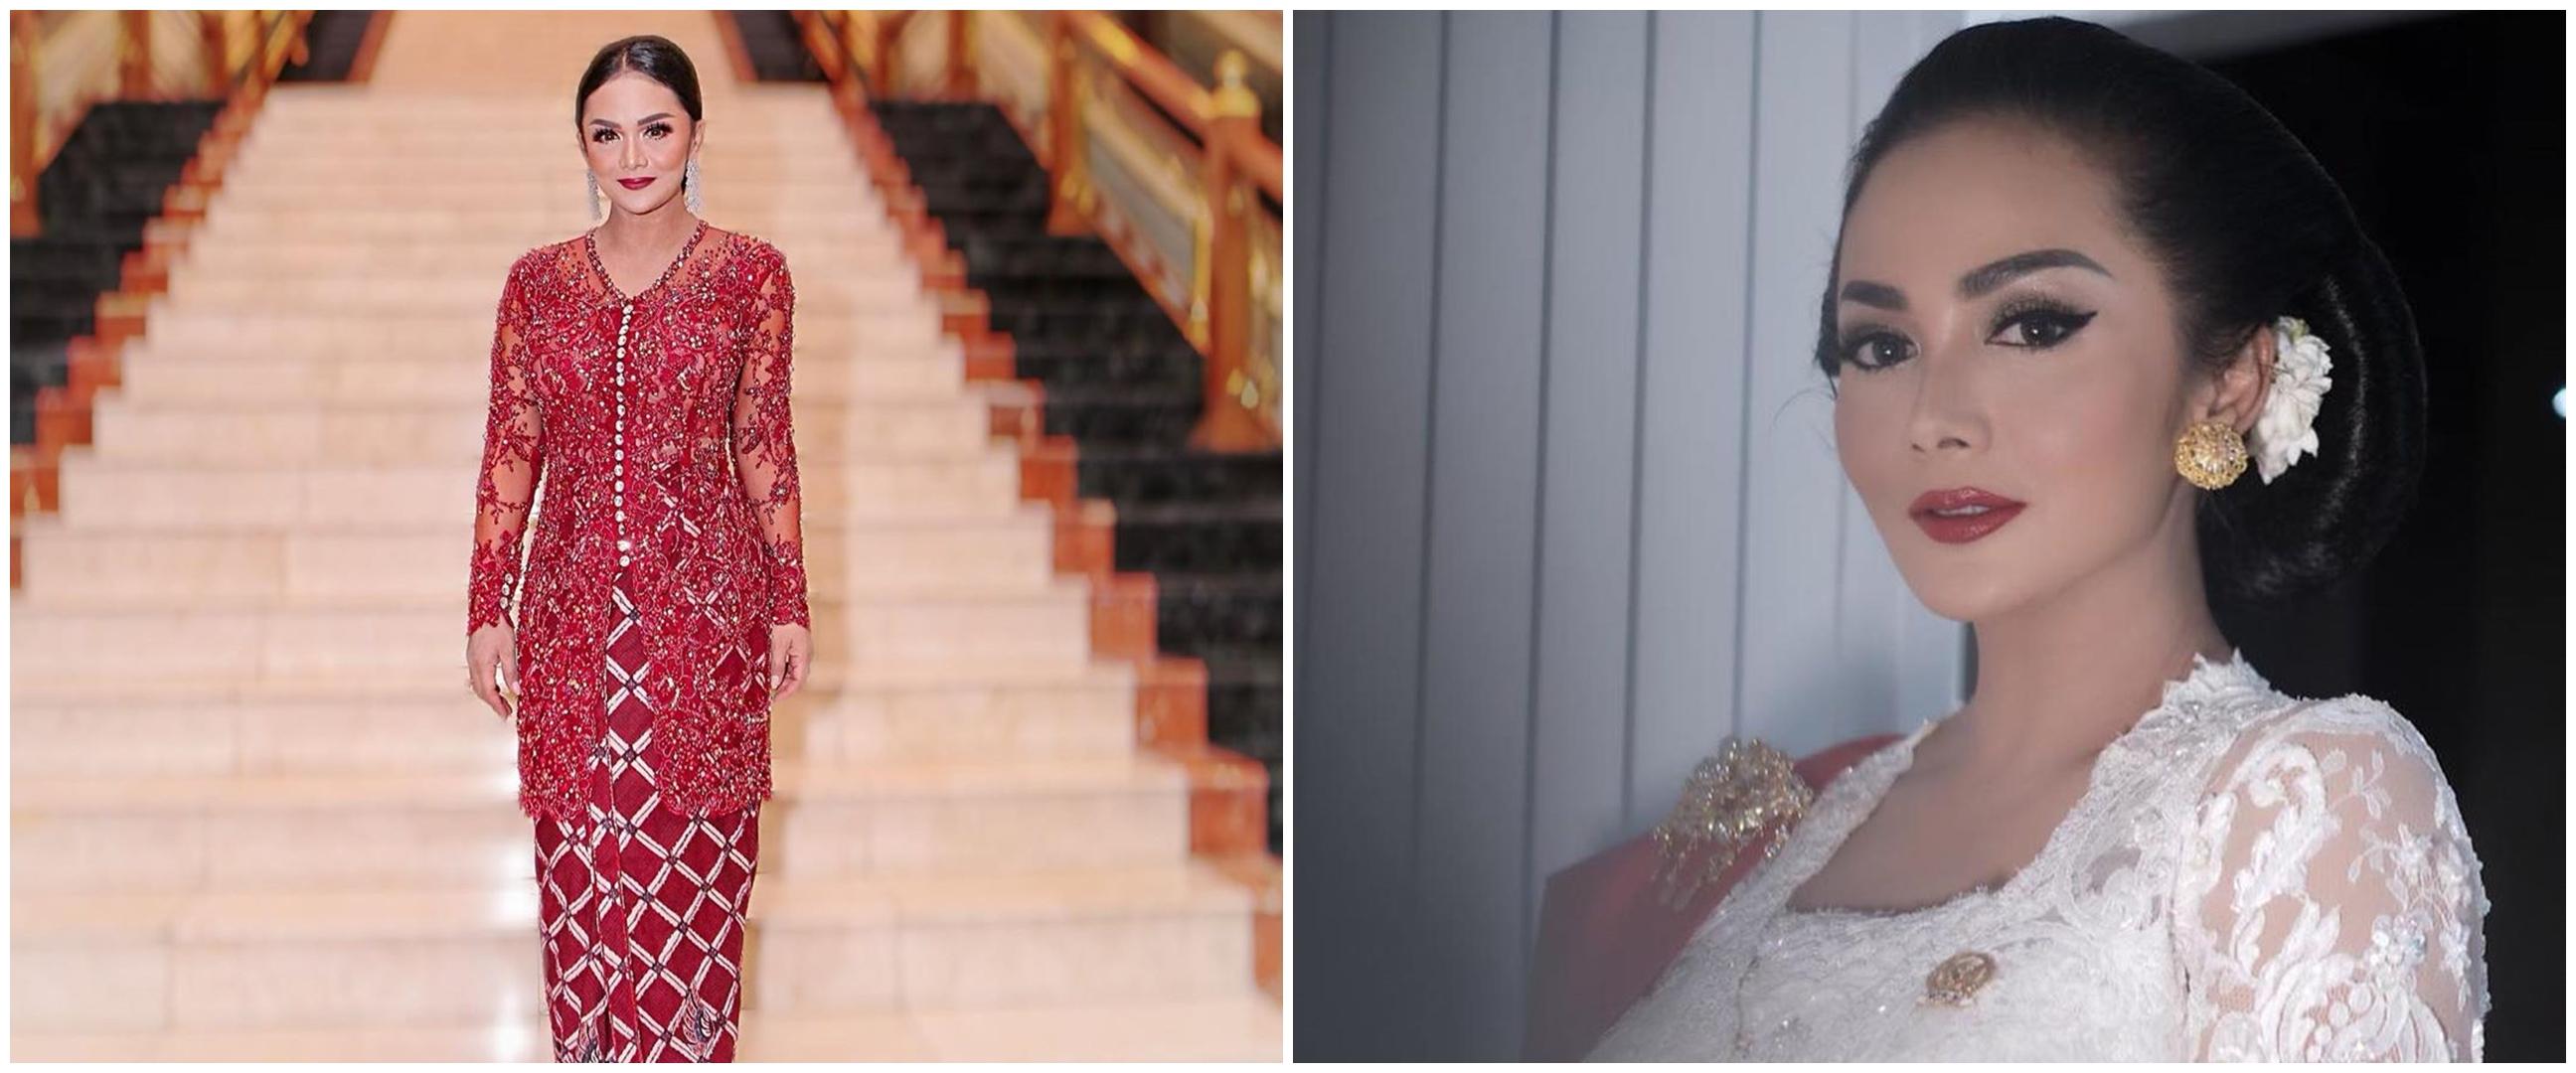 Penampilan Krisdayanti hadiri rapat Paripurna DPR, curi perhatian